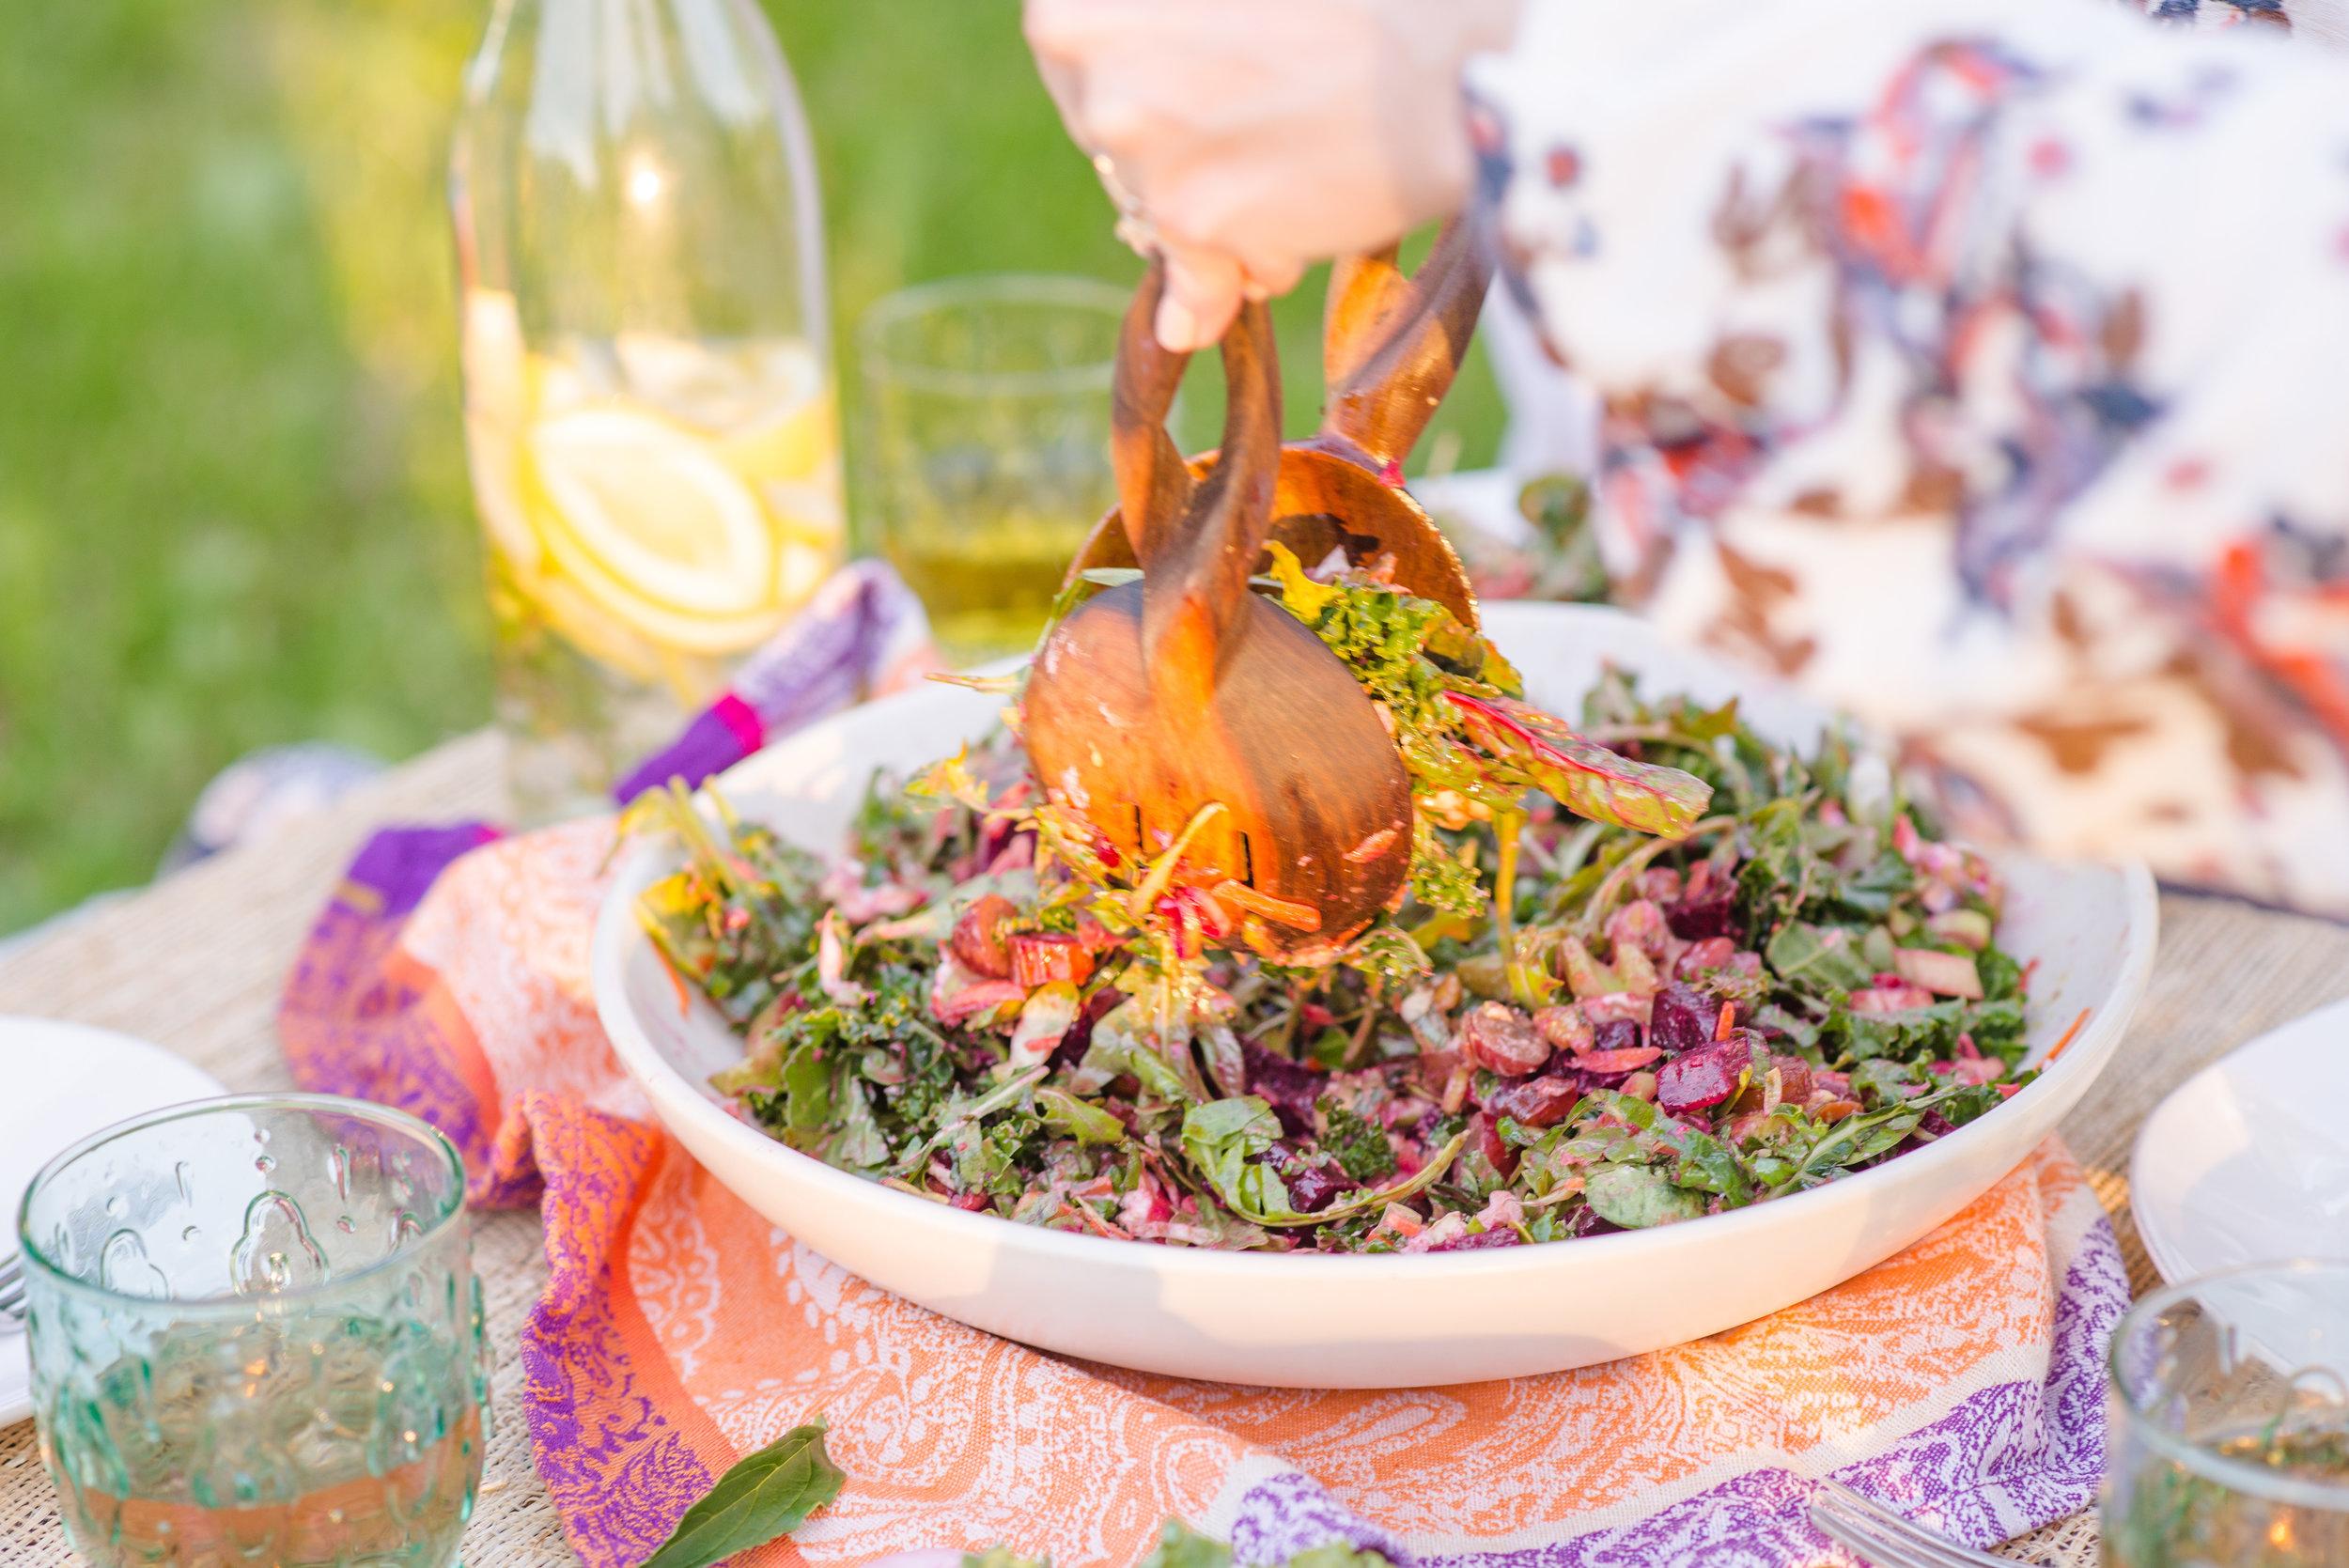 What_to_Bring_Picnic_Salad.jpg